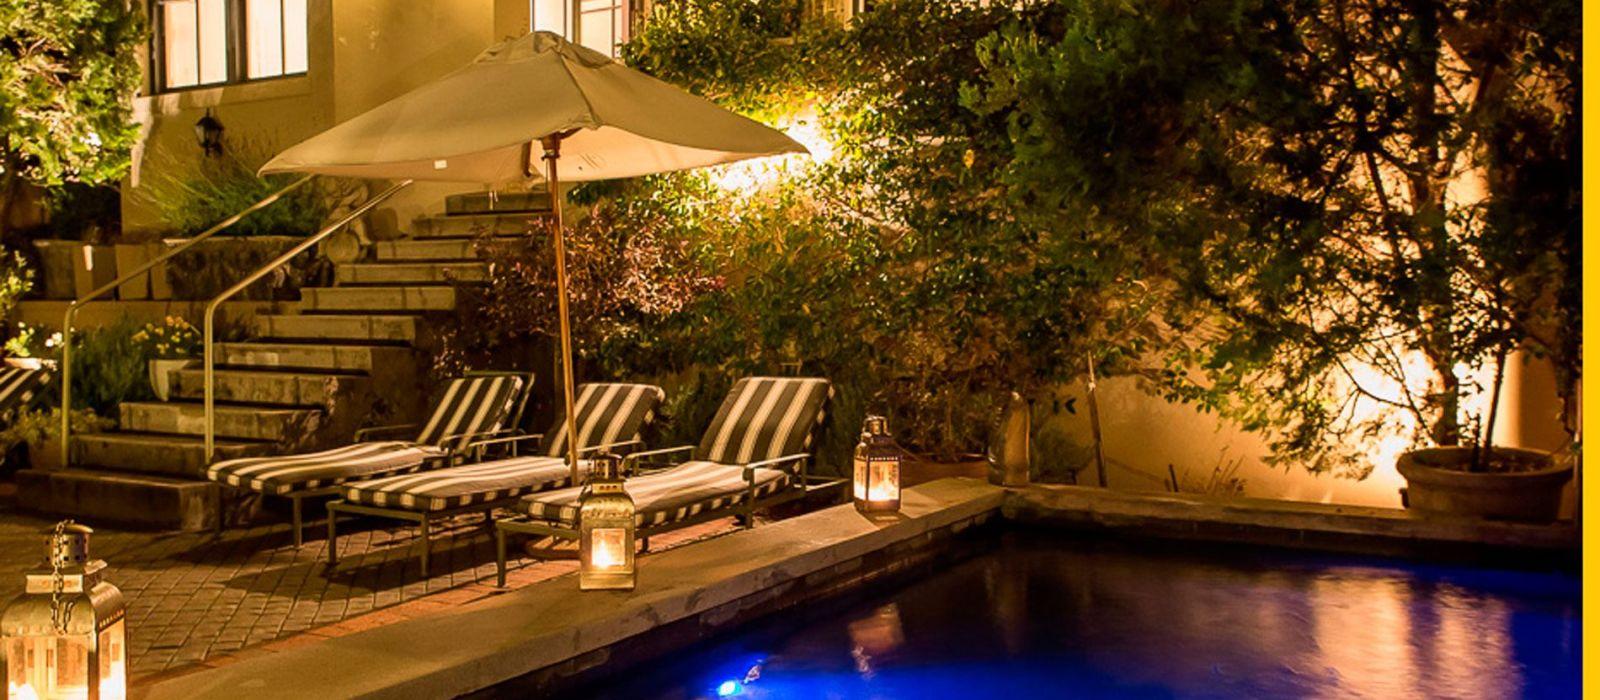 Hotel Welgelegen Guest House South Africa